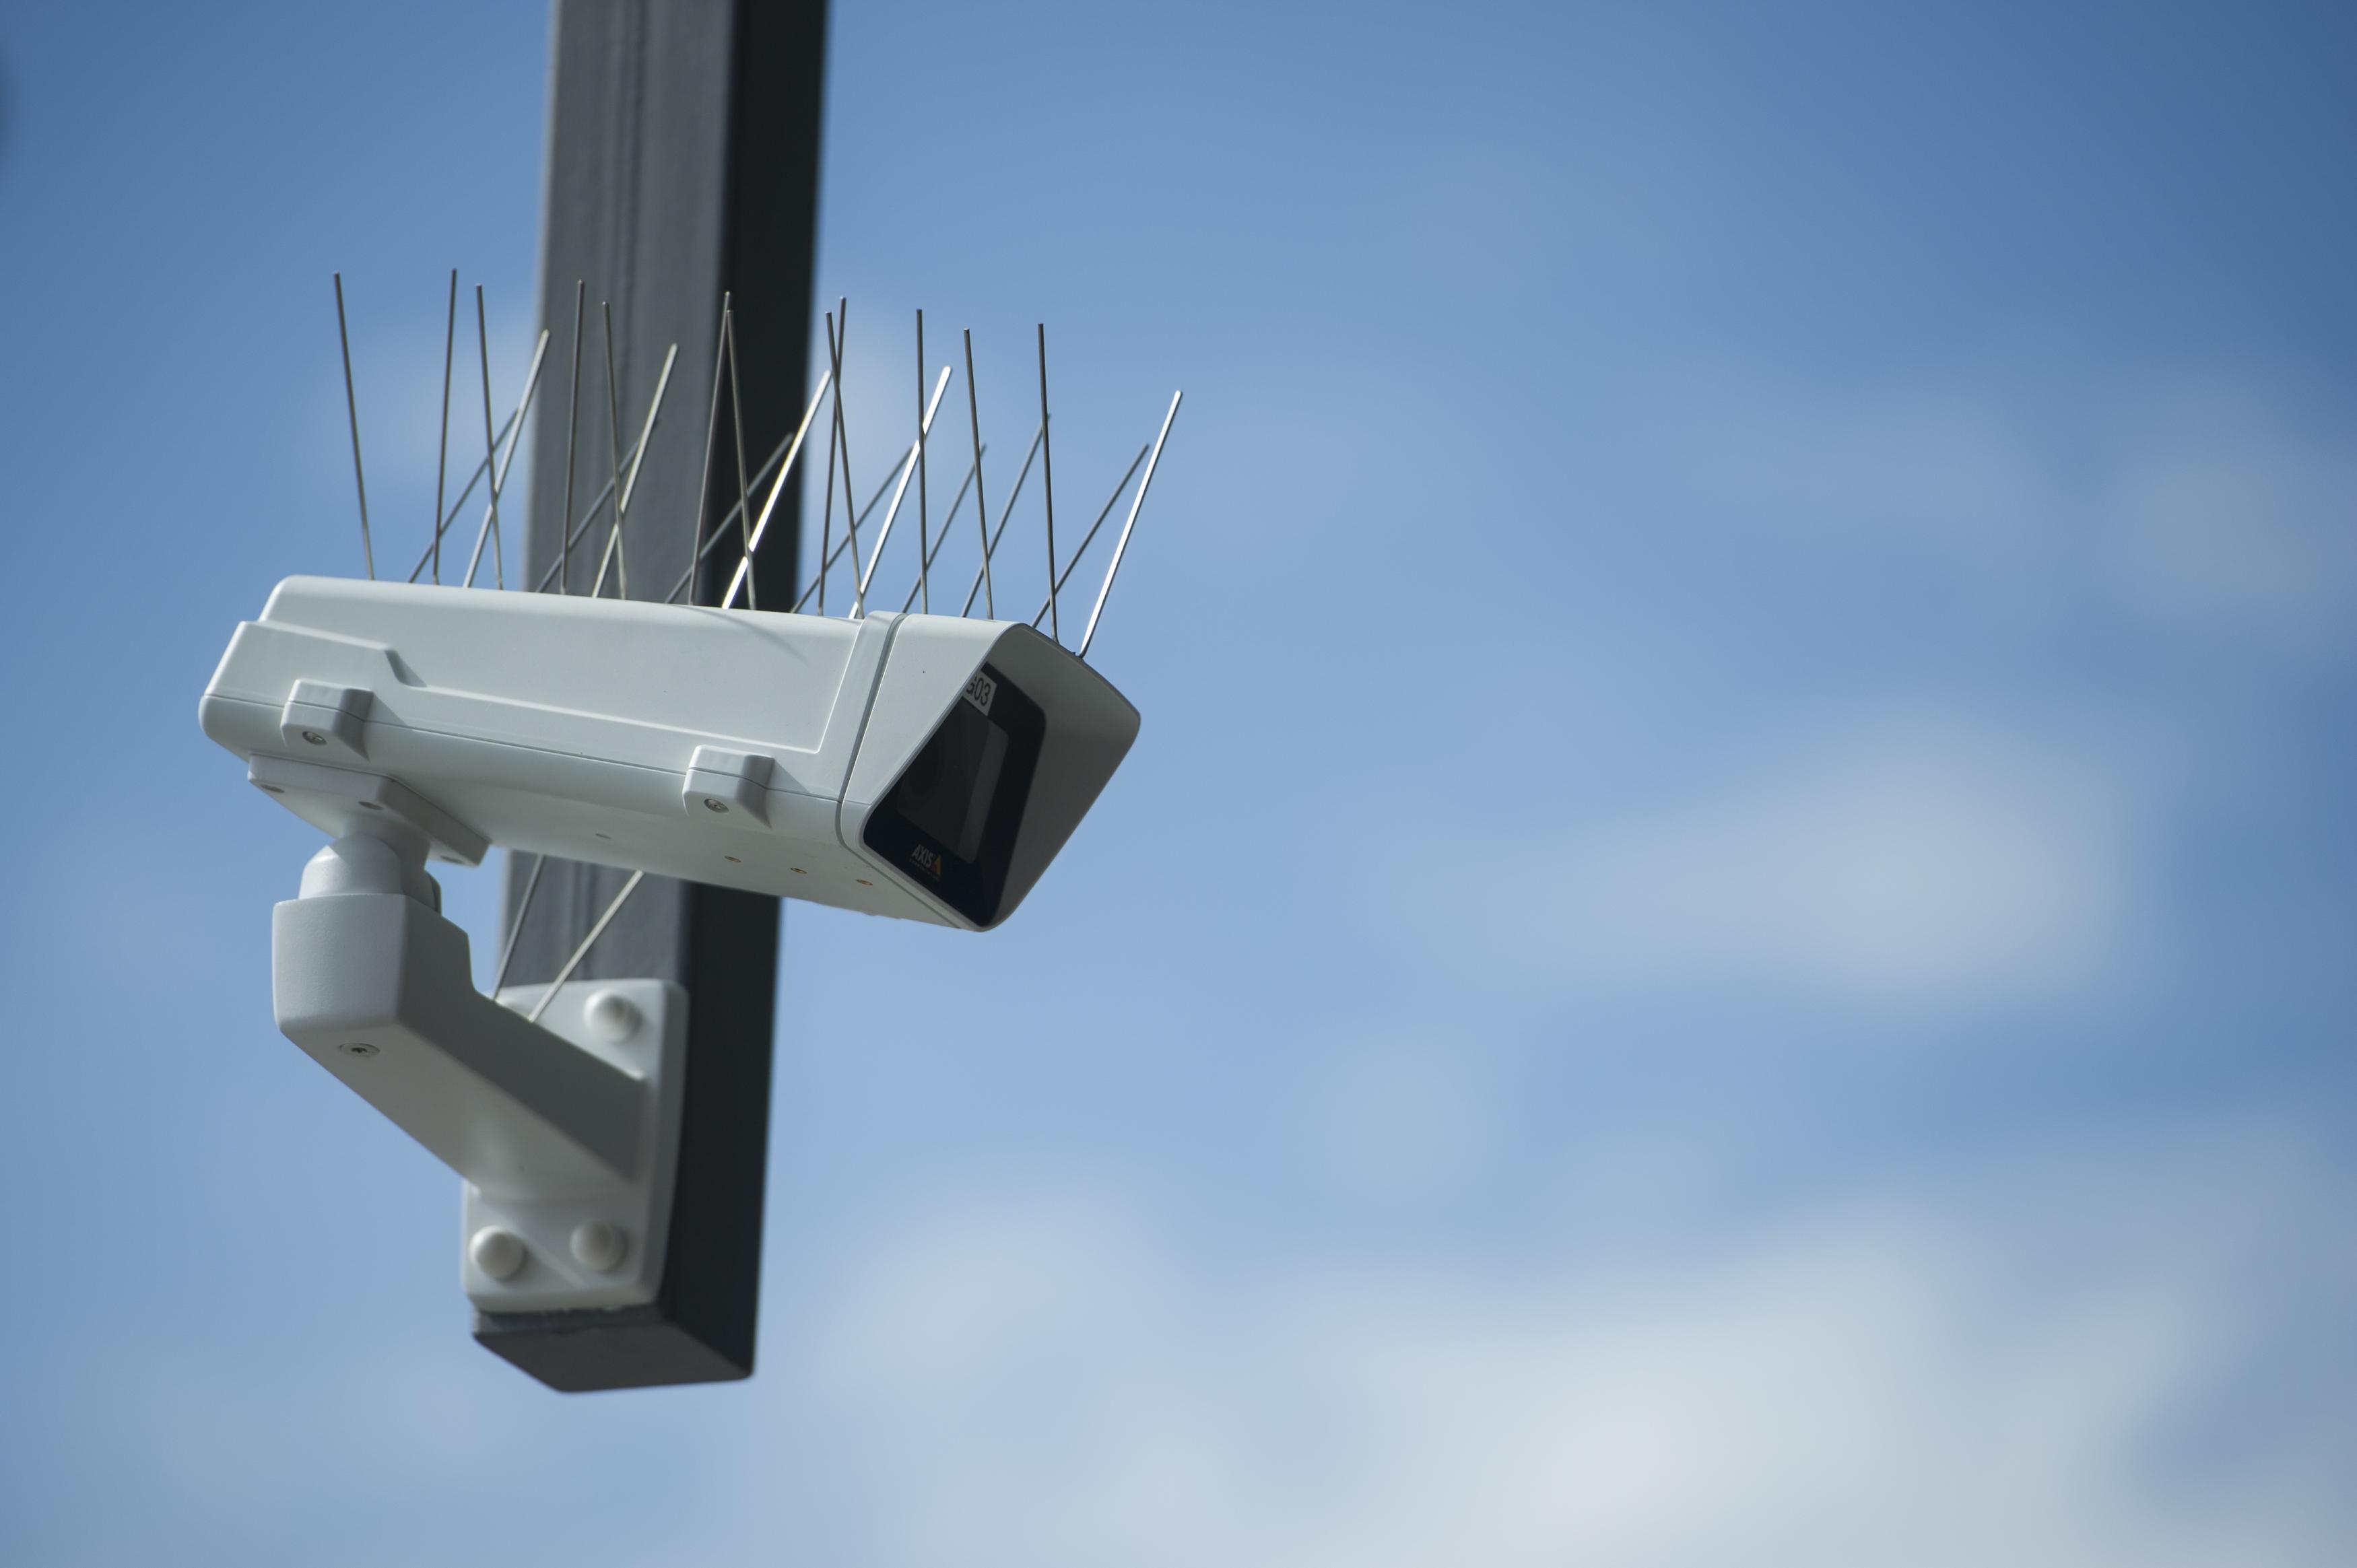 San Francisco's facial recognition technology ban, explained